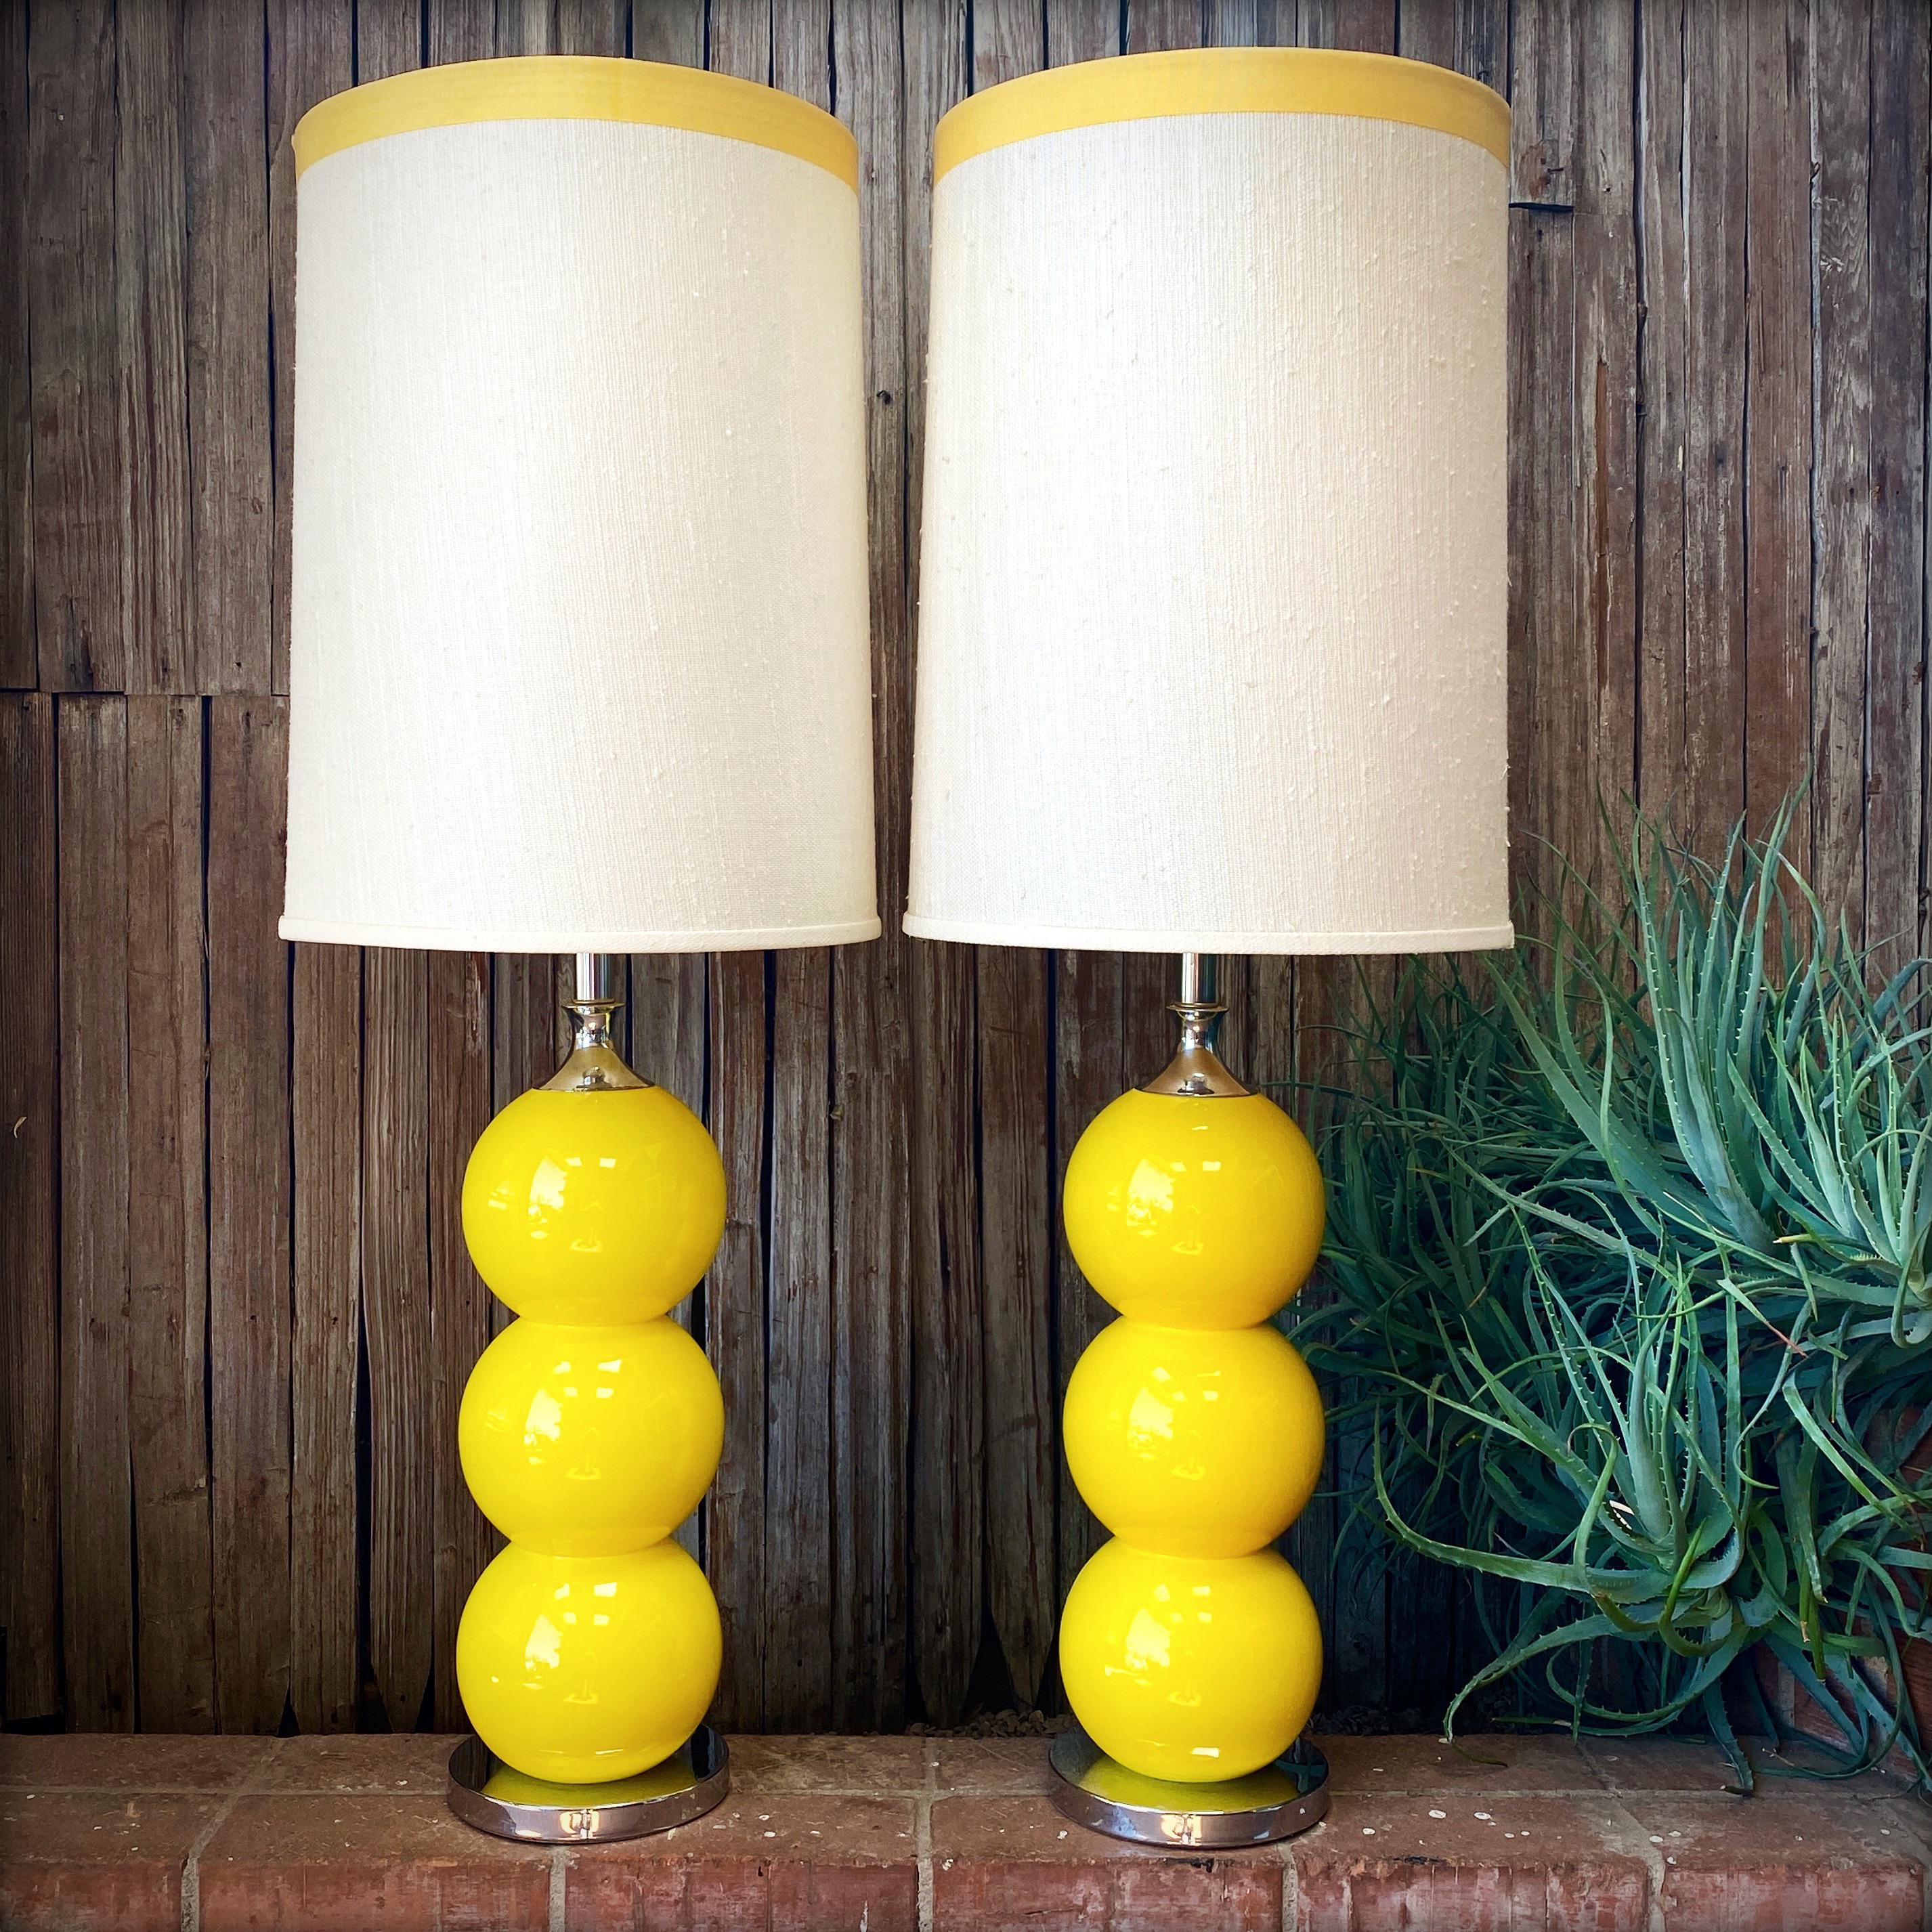 Pair of Mid-Century Ceramic Yellow Lamps with Original Shades